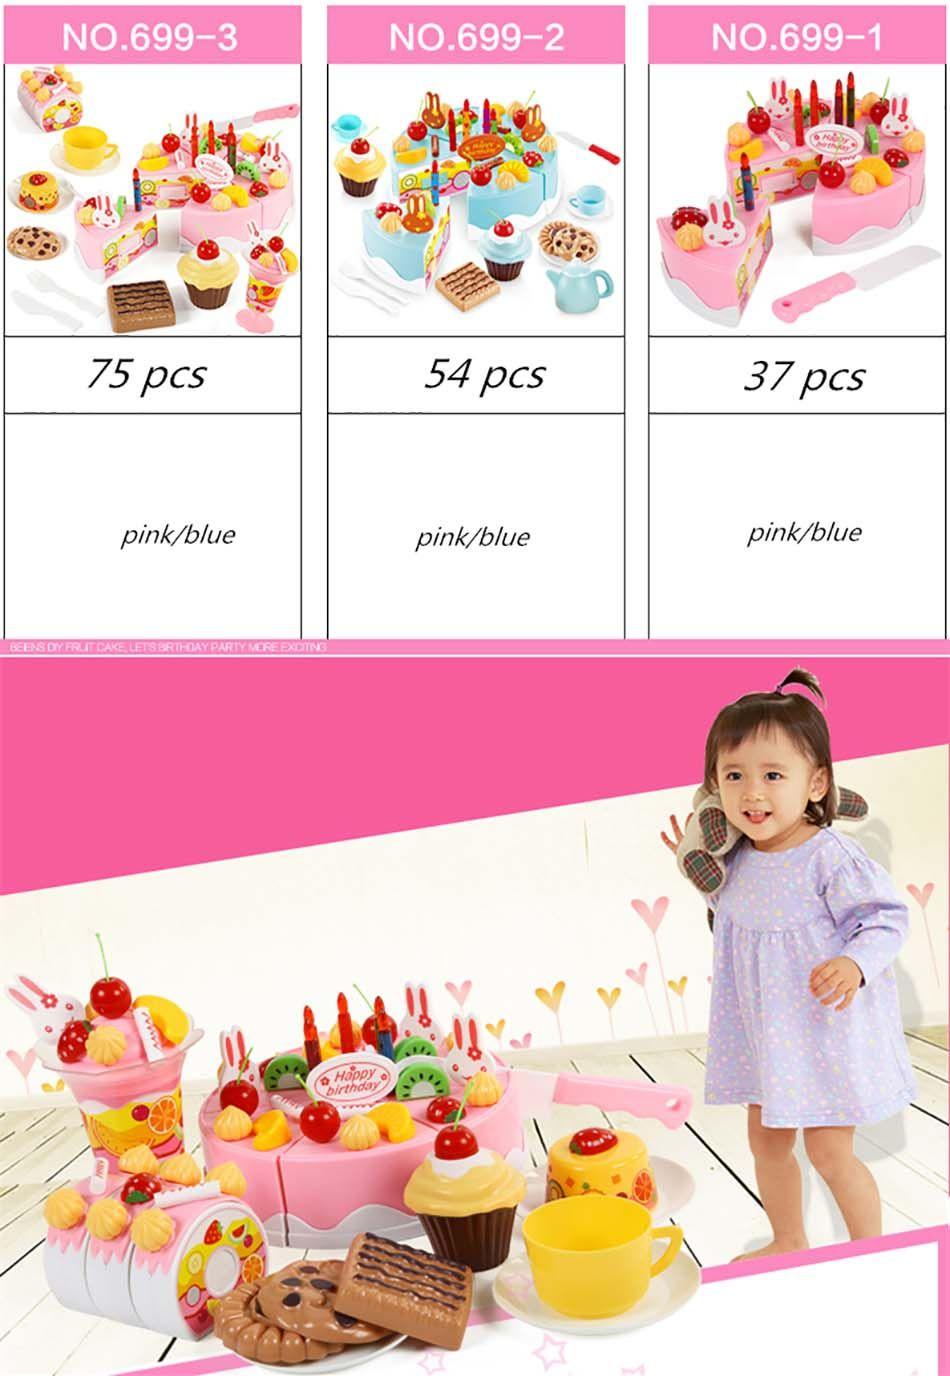 Birthday toys images  Beiens Brand Toys DIY Toys Pcs Pretend Play Cutting Birthday